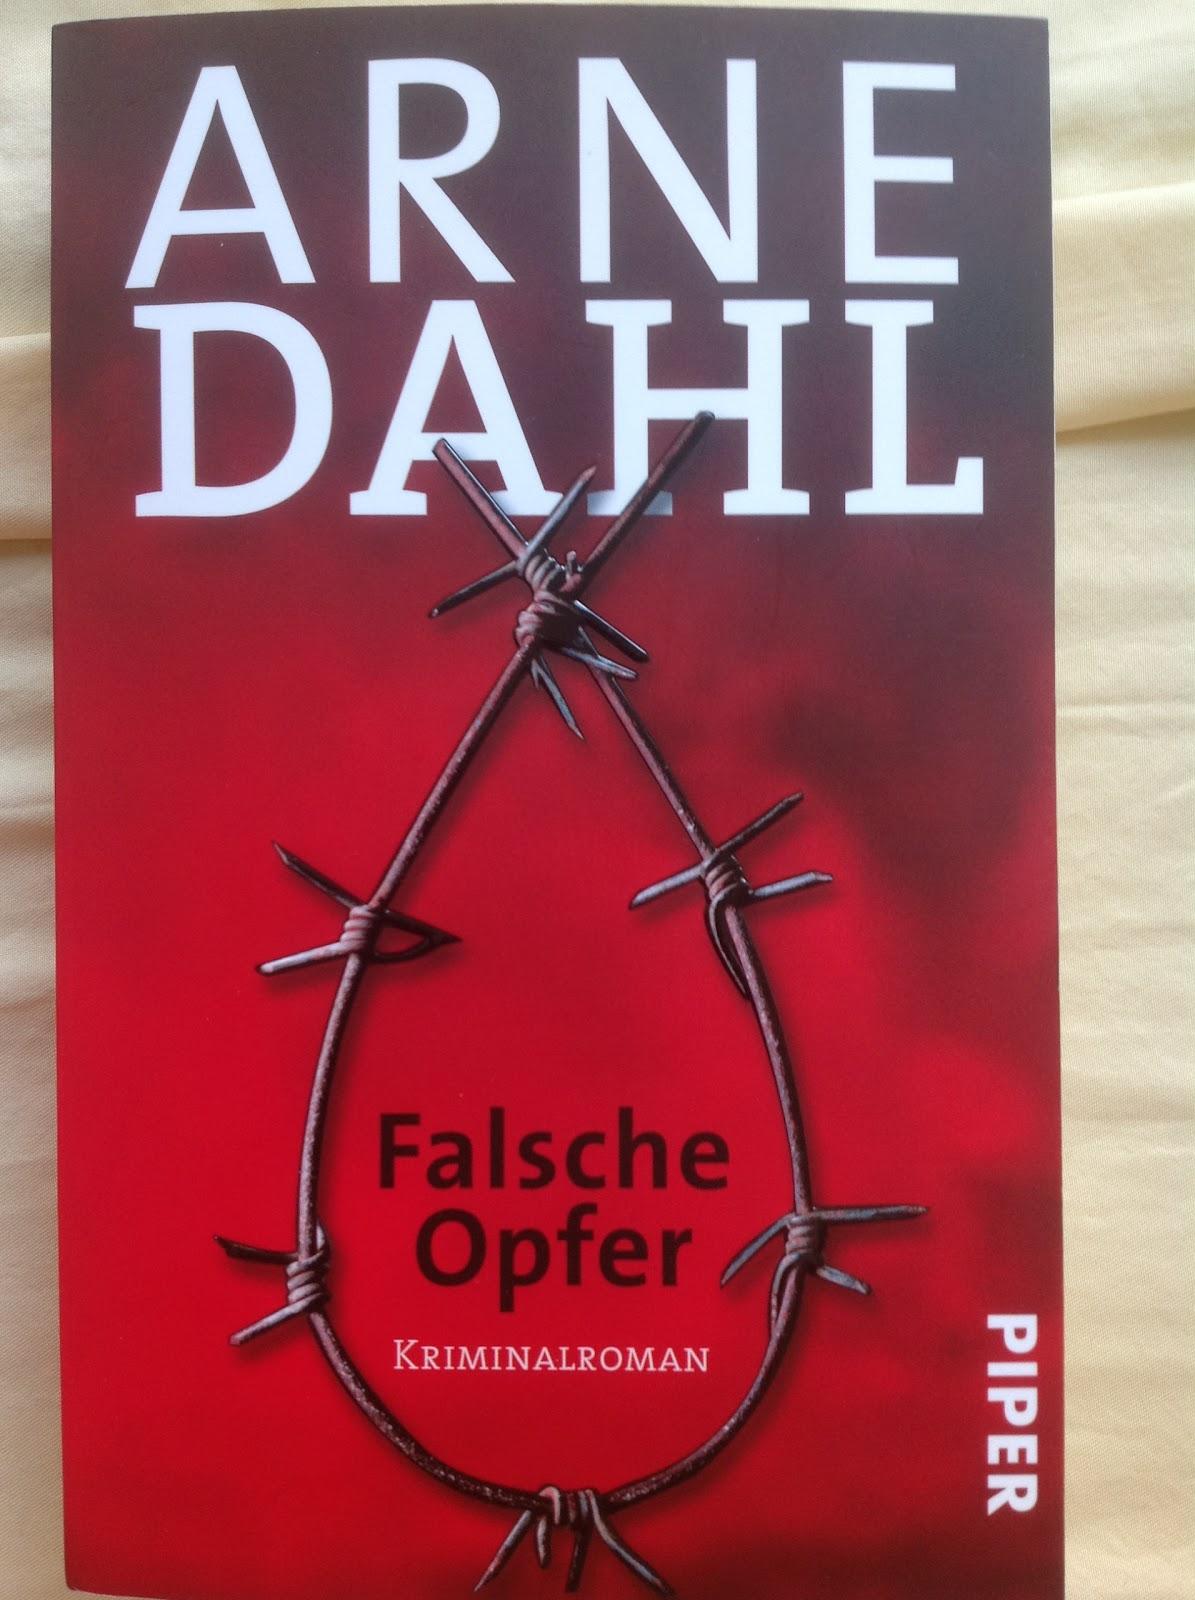 Arne Dahl Falsche Opfer